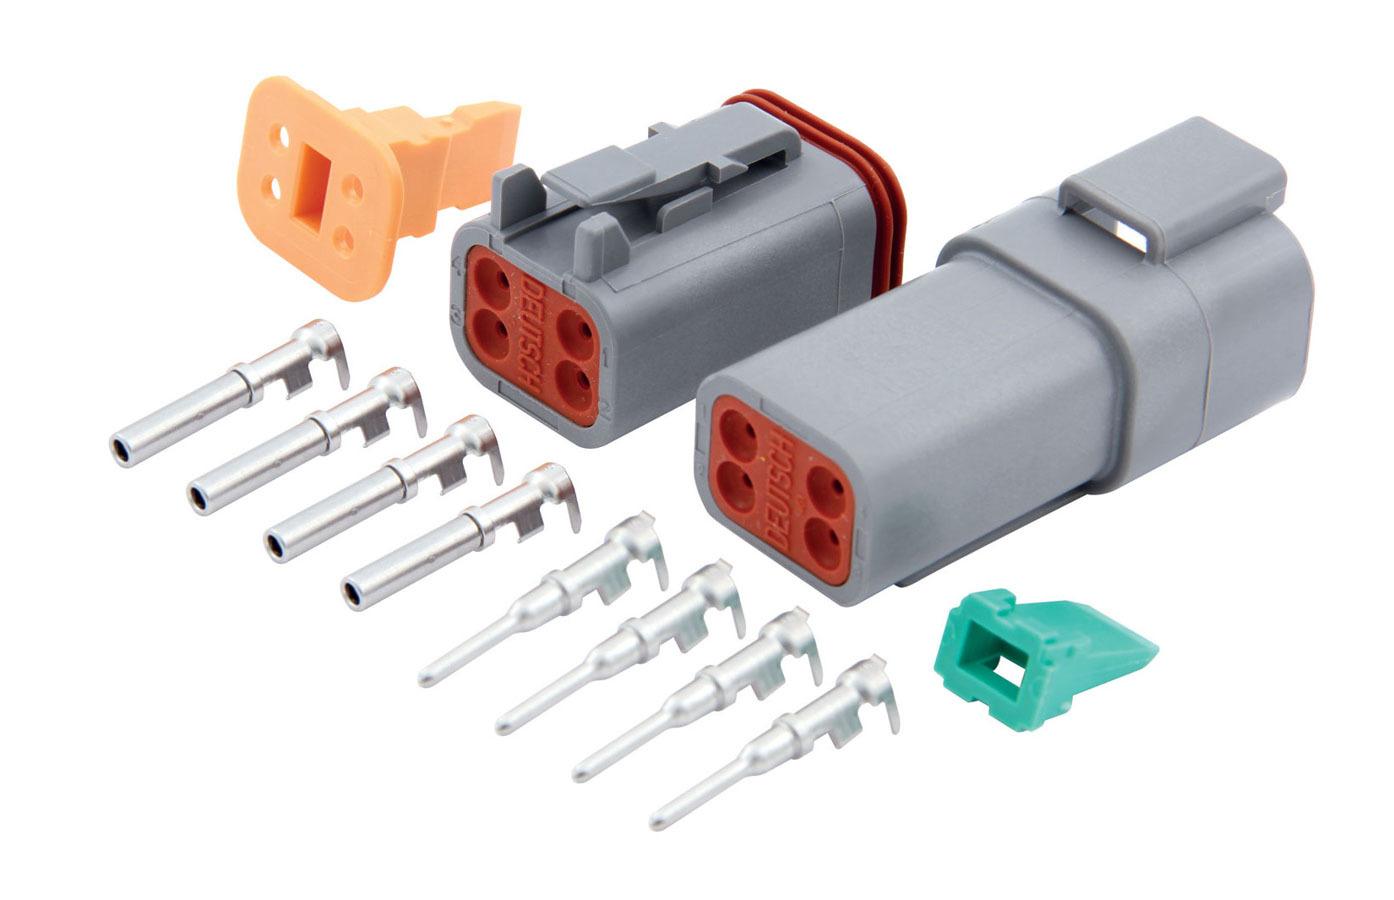 QuickCar 71-342 Electrical Connector, Deutsch Connector, 4 Pin, Housings / Pins / Seals / Wedge Locks, Kit